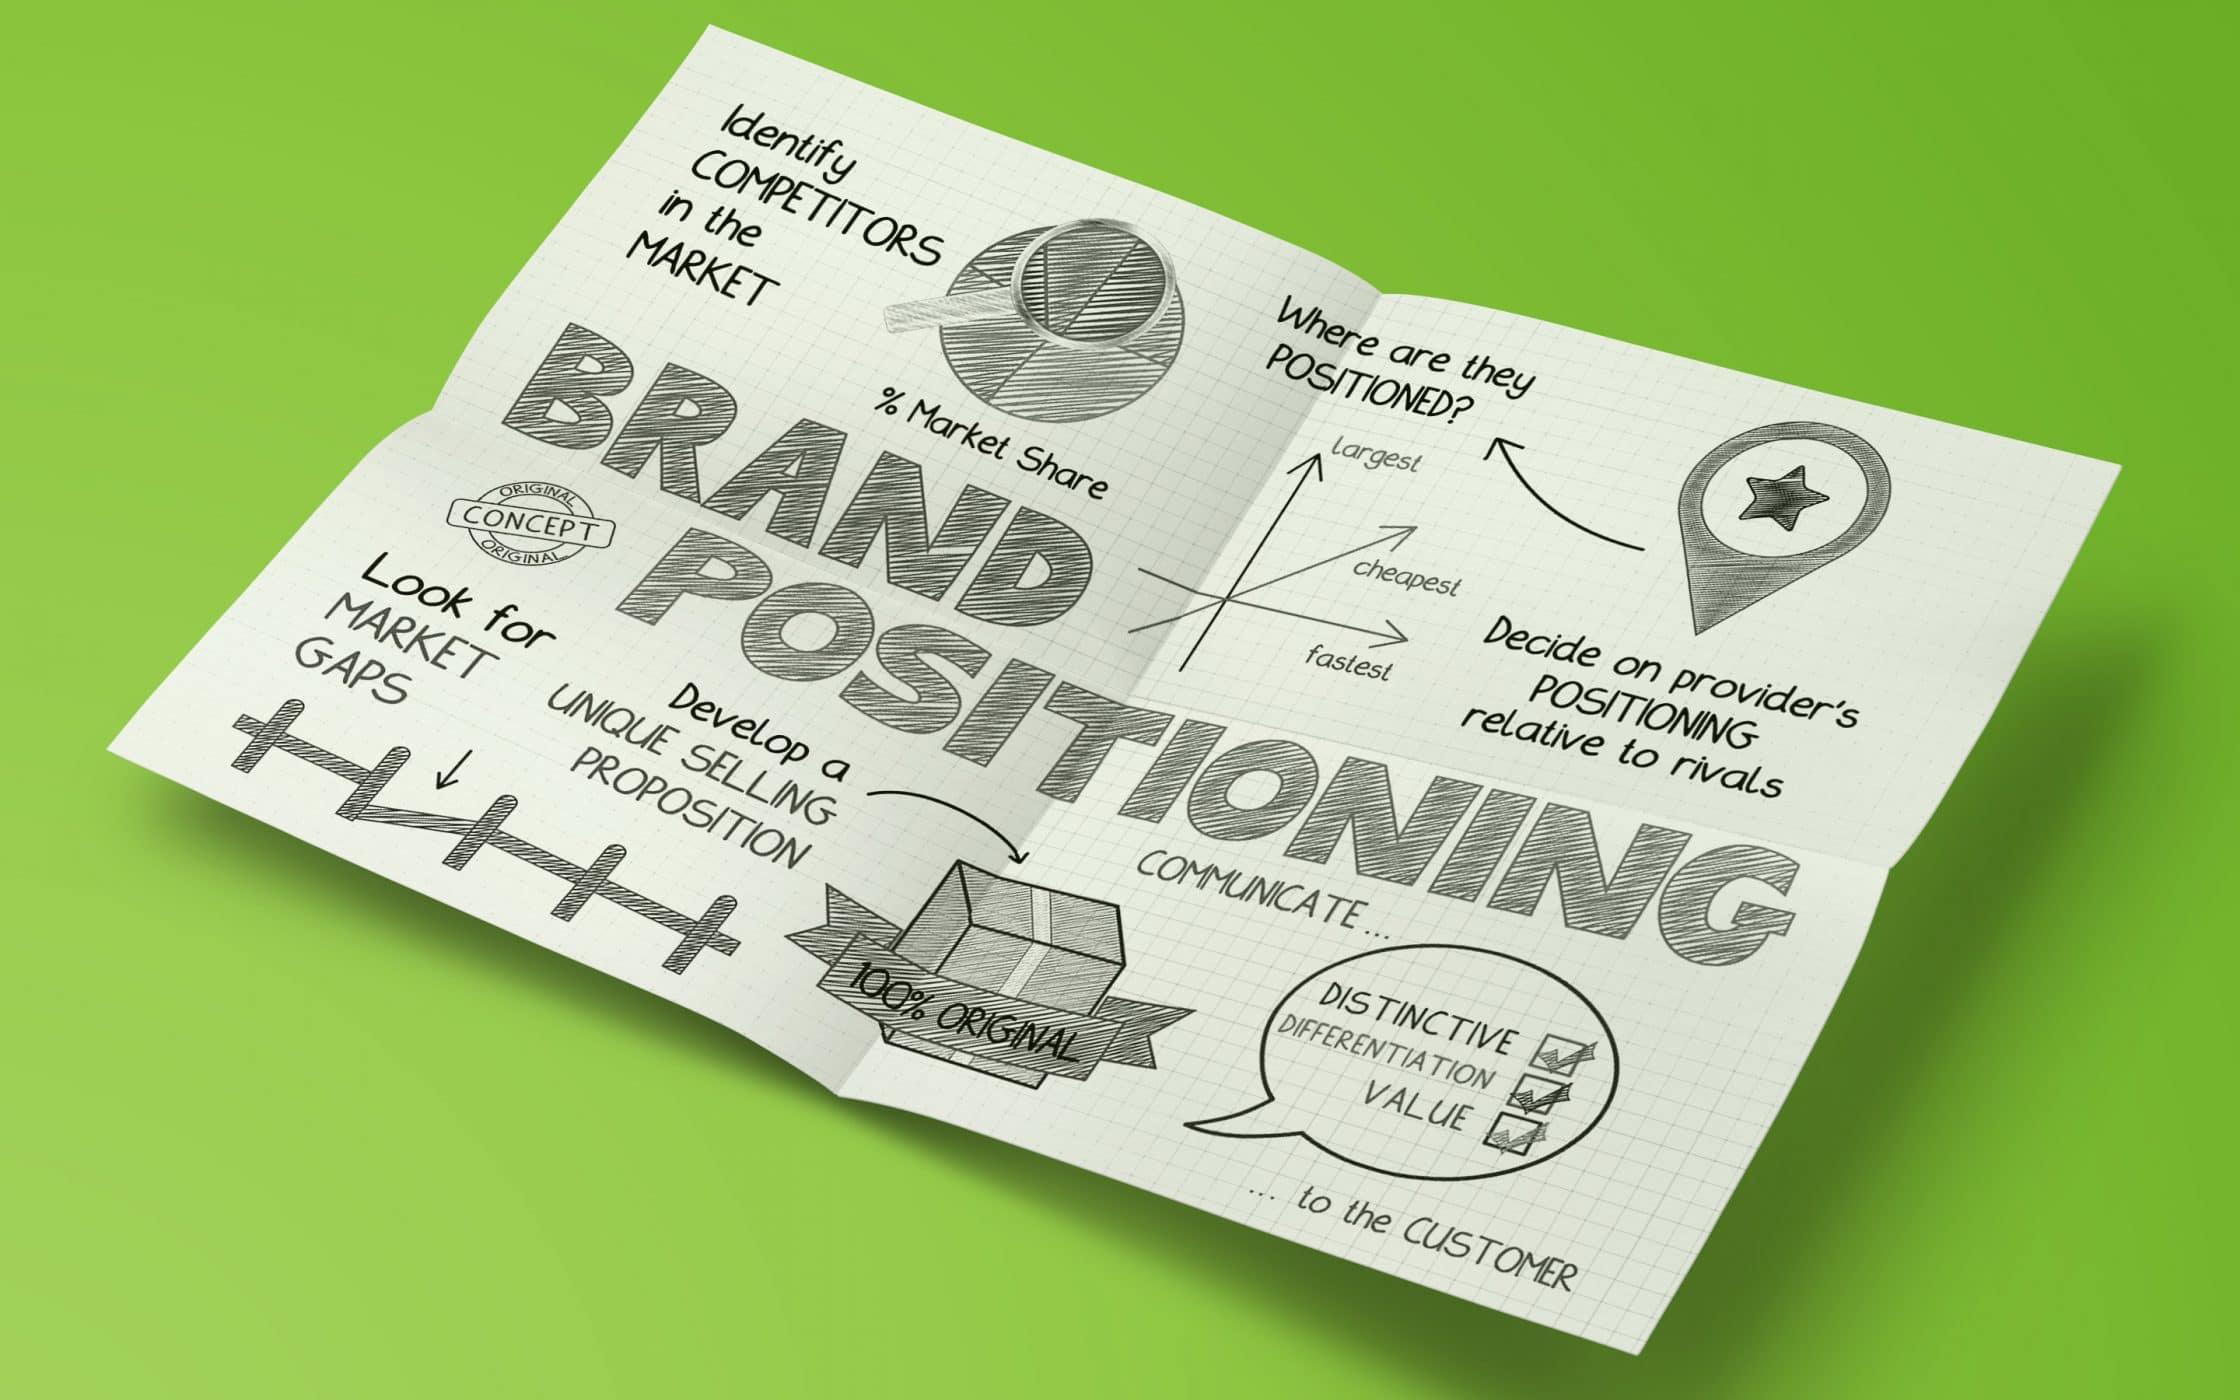 Brand-Positioning-2